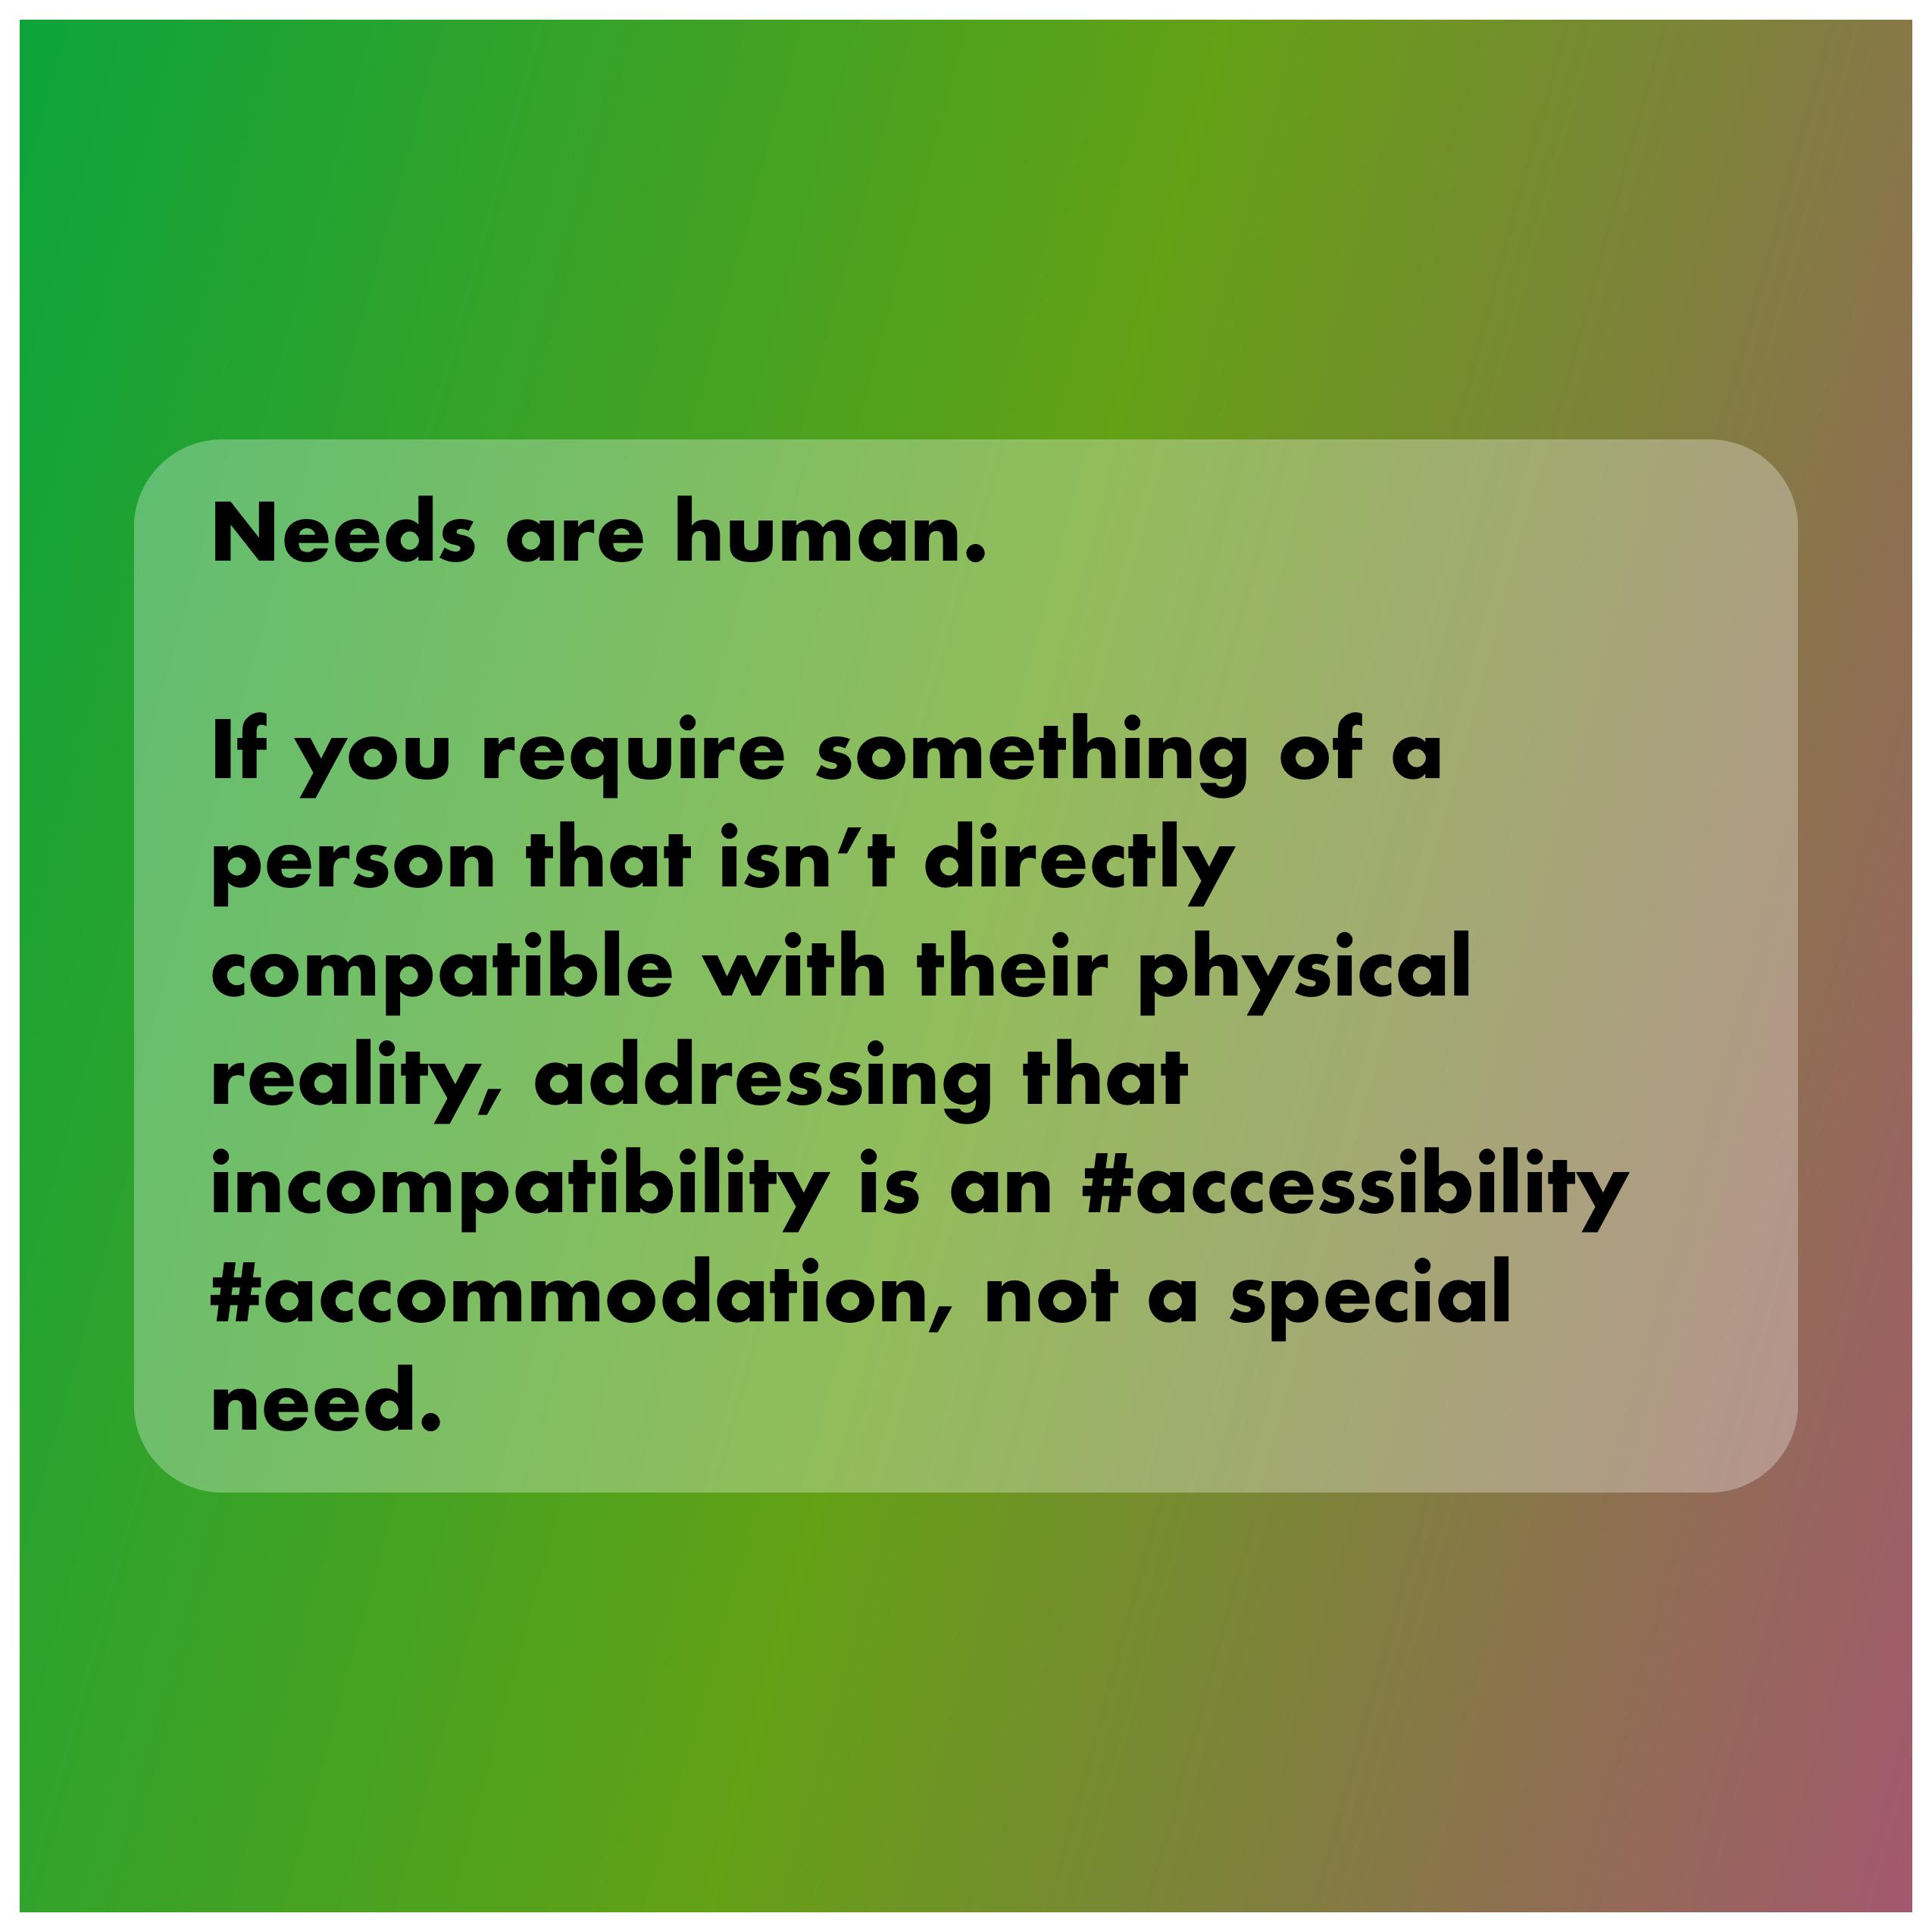 Needs are human